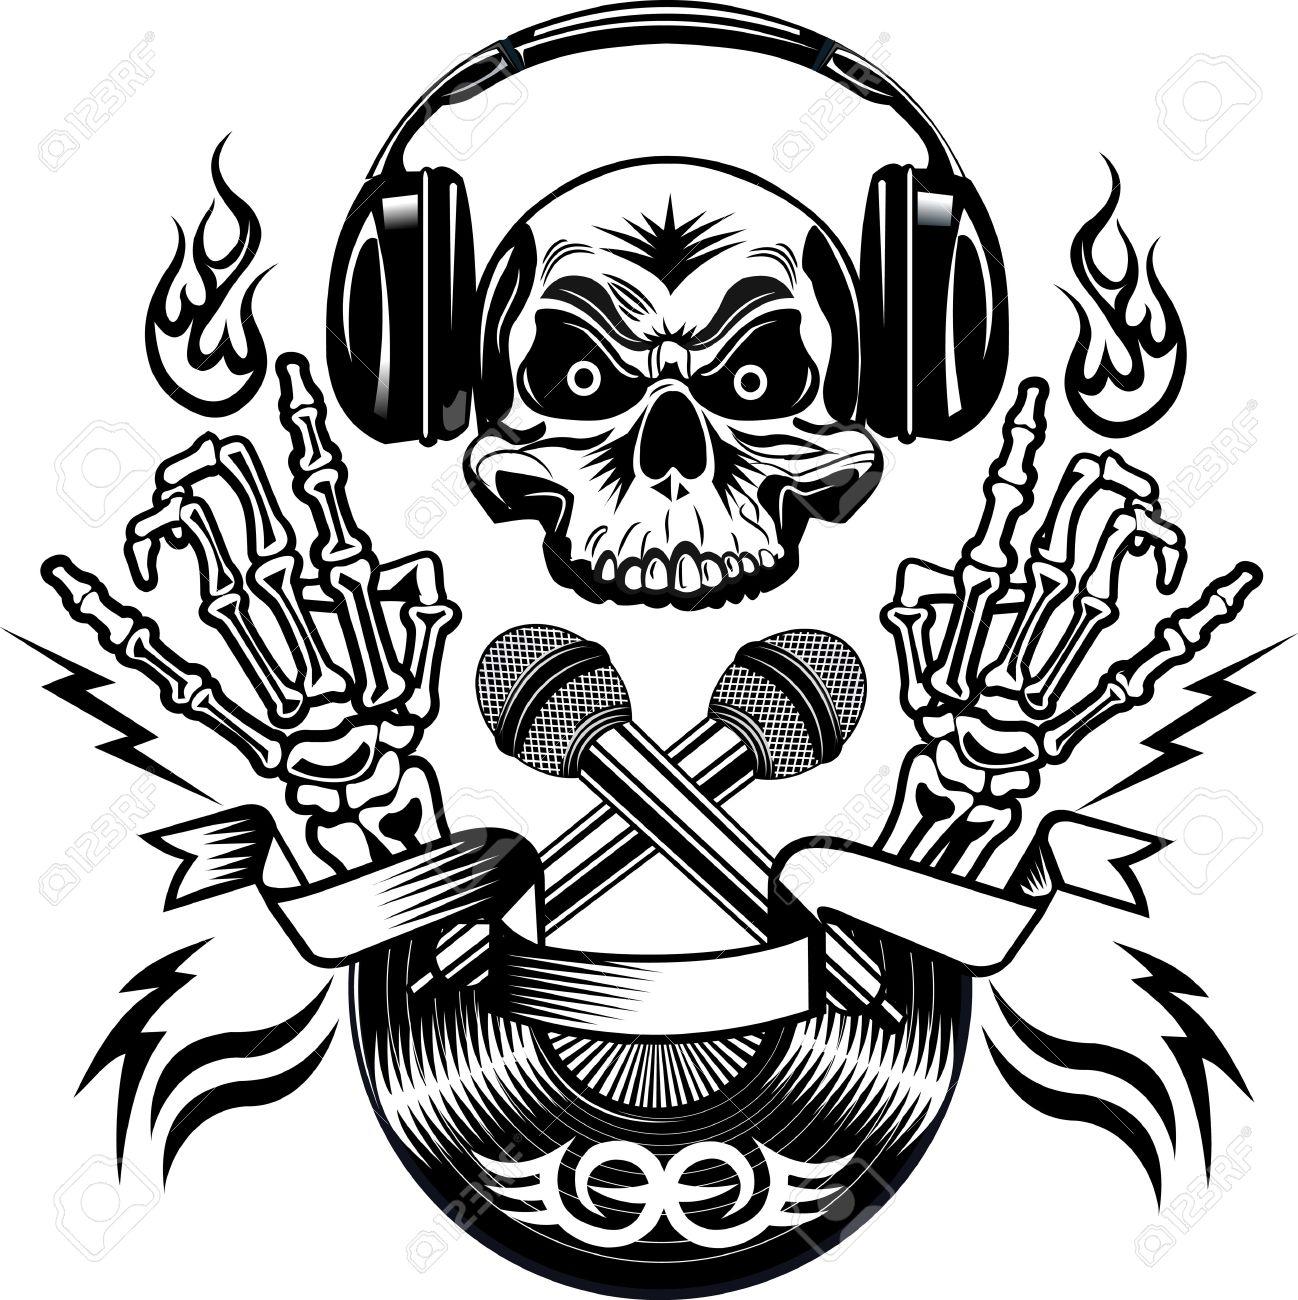 1298x1300 Tattoo Dj Human Skull And Microphone Royalty Free Cliparts